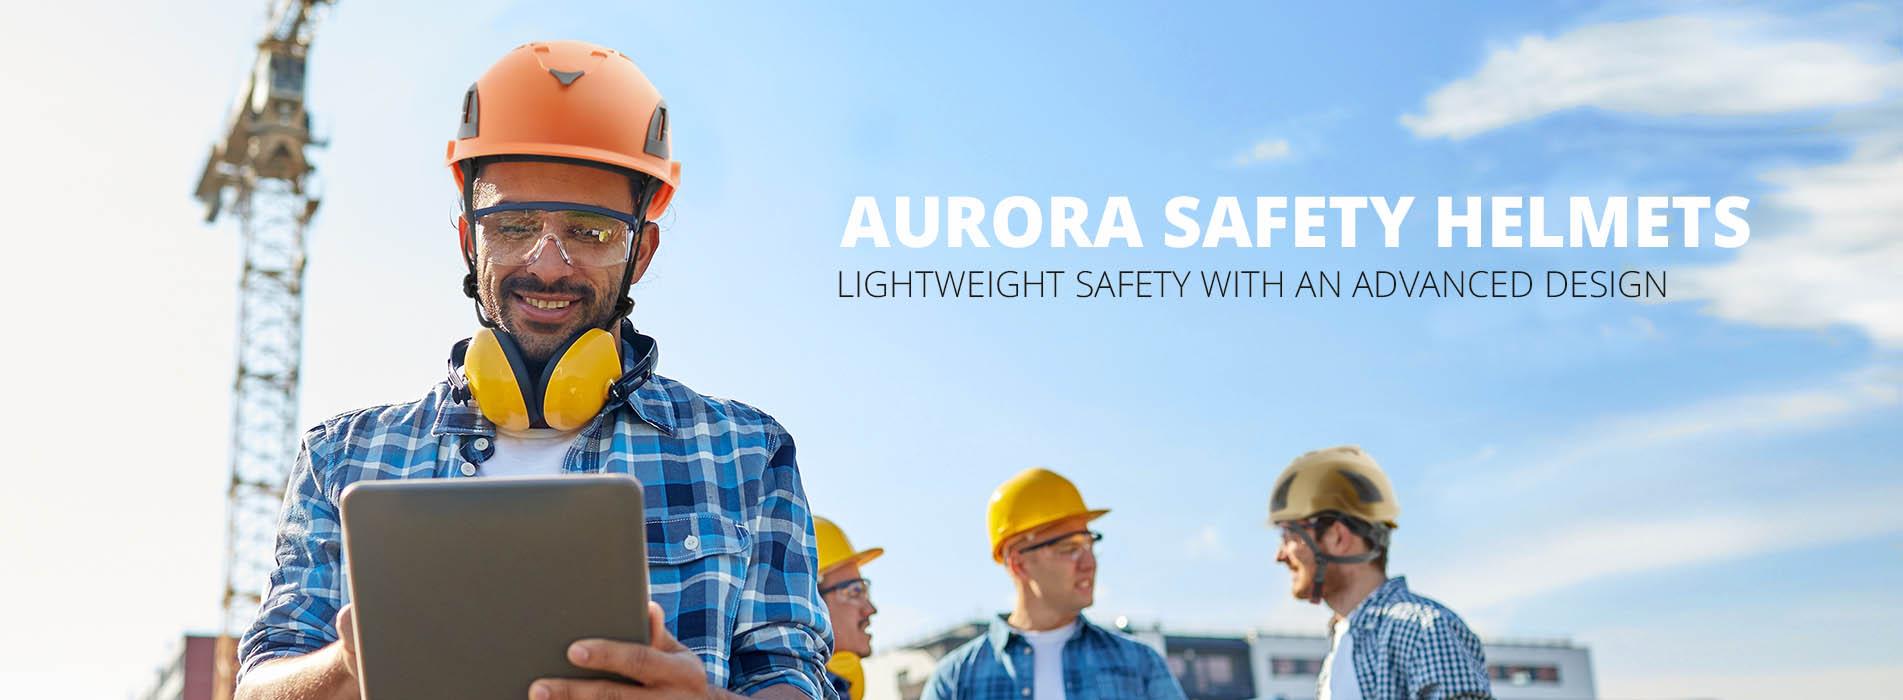 safety-helmet-top-banner